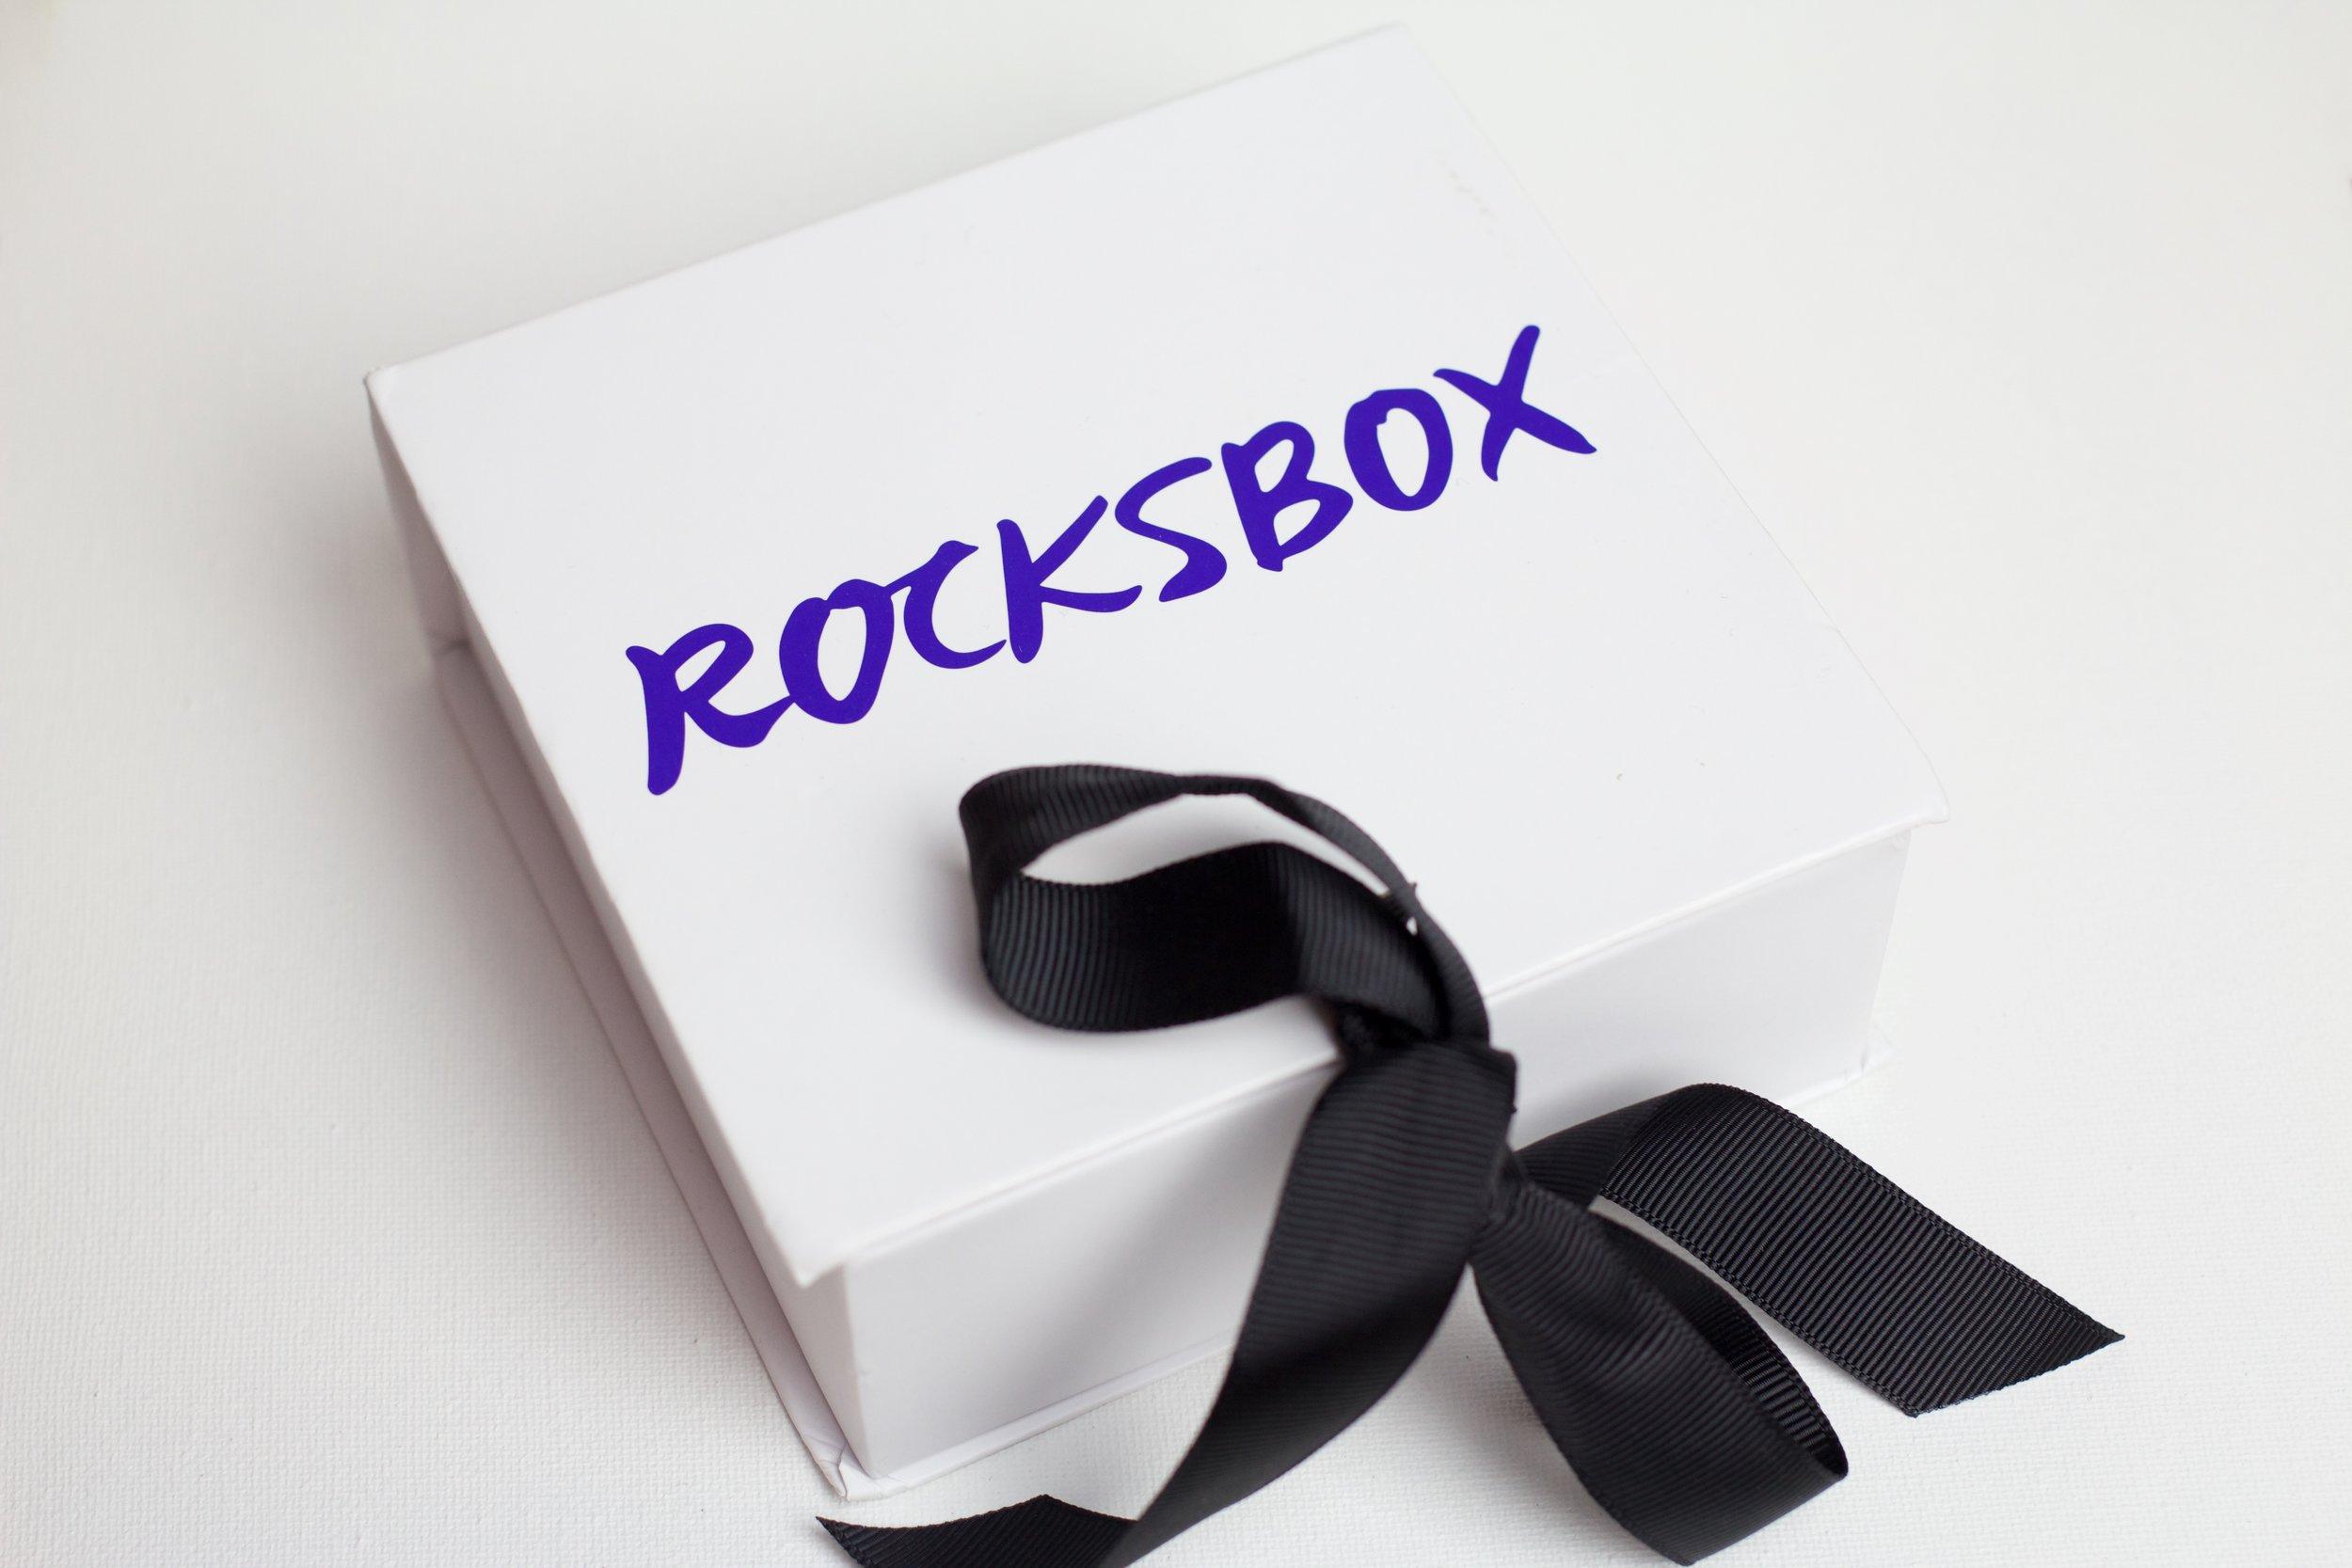 RocksBox 6